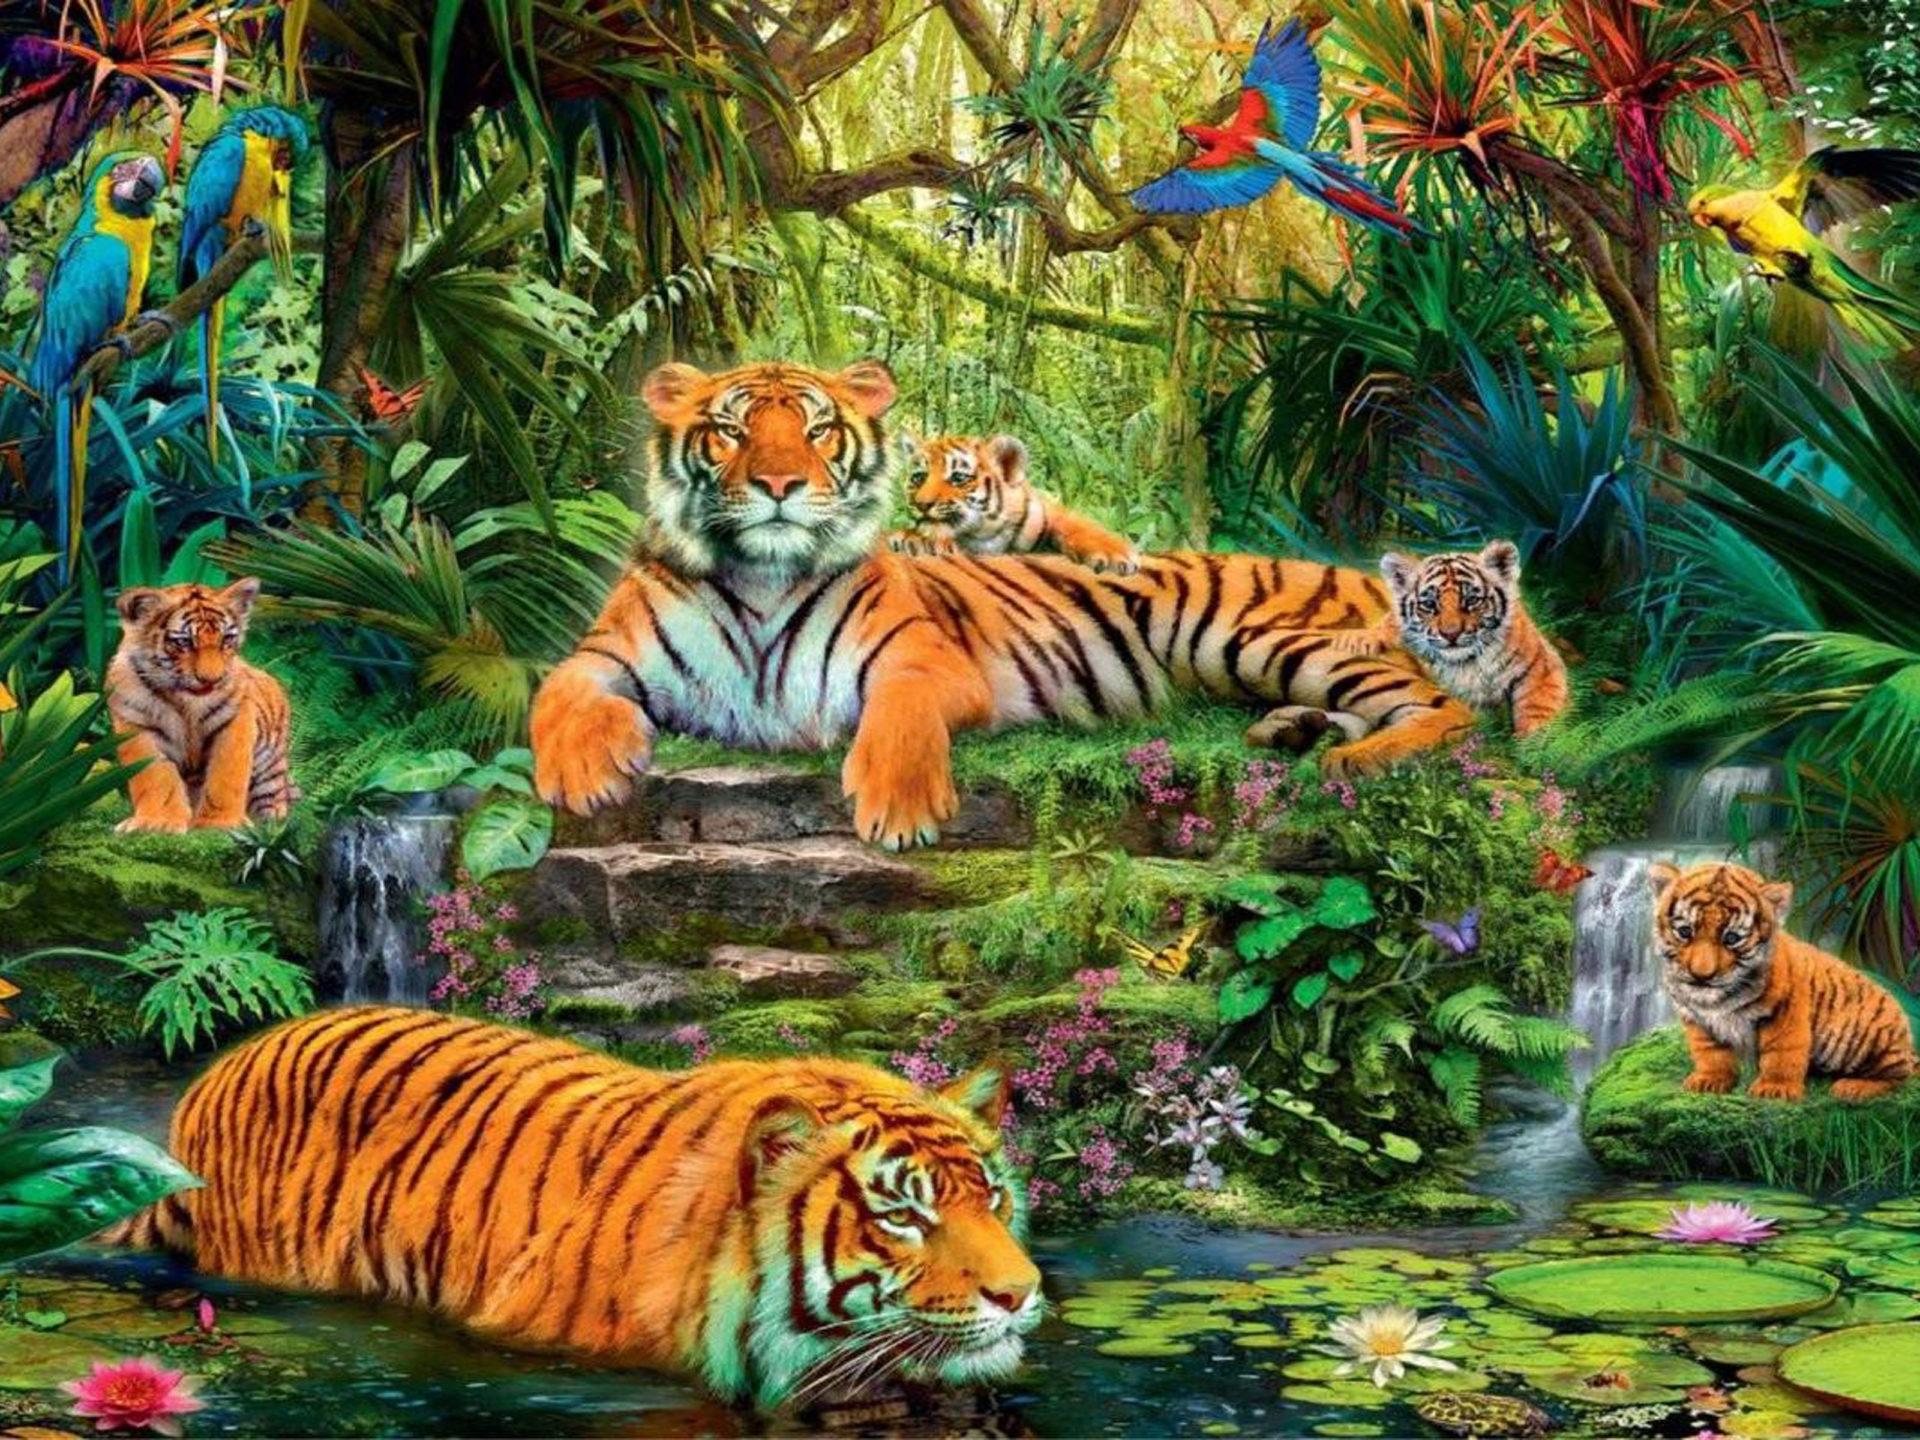 Eagle Wallpaper Iphone X Animal Kingdom Jungle Tigers Birds Hd Wallpaper